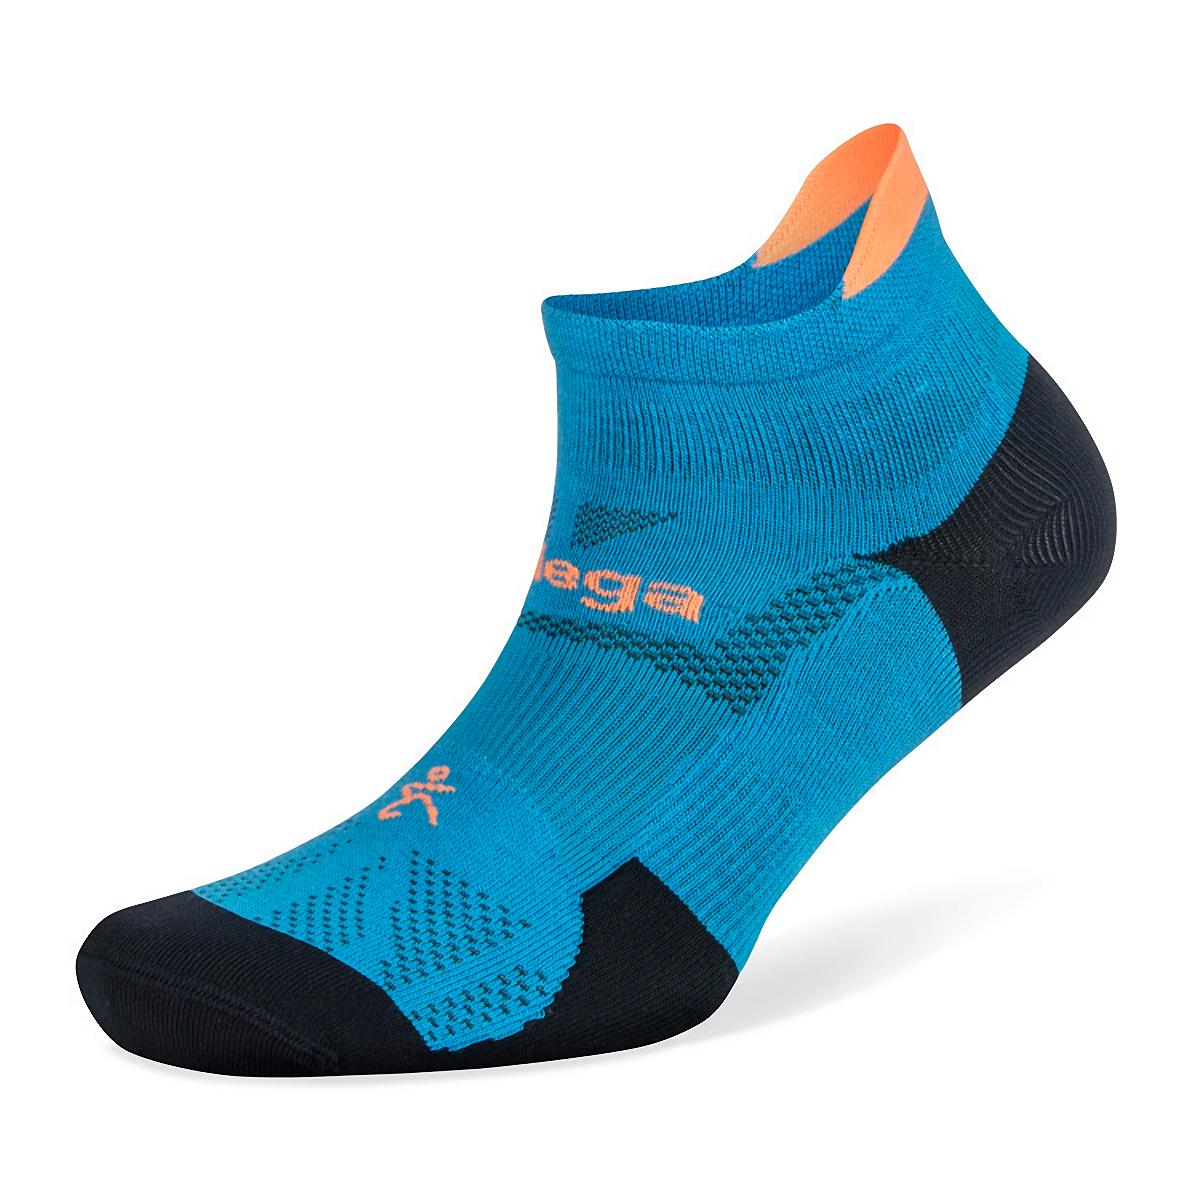 Balega Hidden Dry No Show Socks - Color: Bright Turquoise/Navy - Size: S, Bright Turquoise/Navy, large, image 1